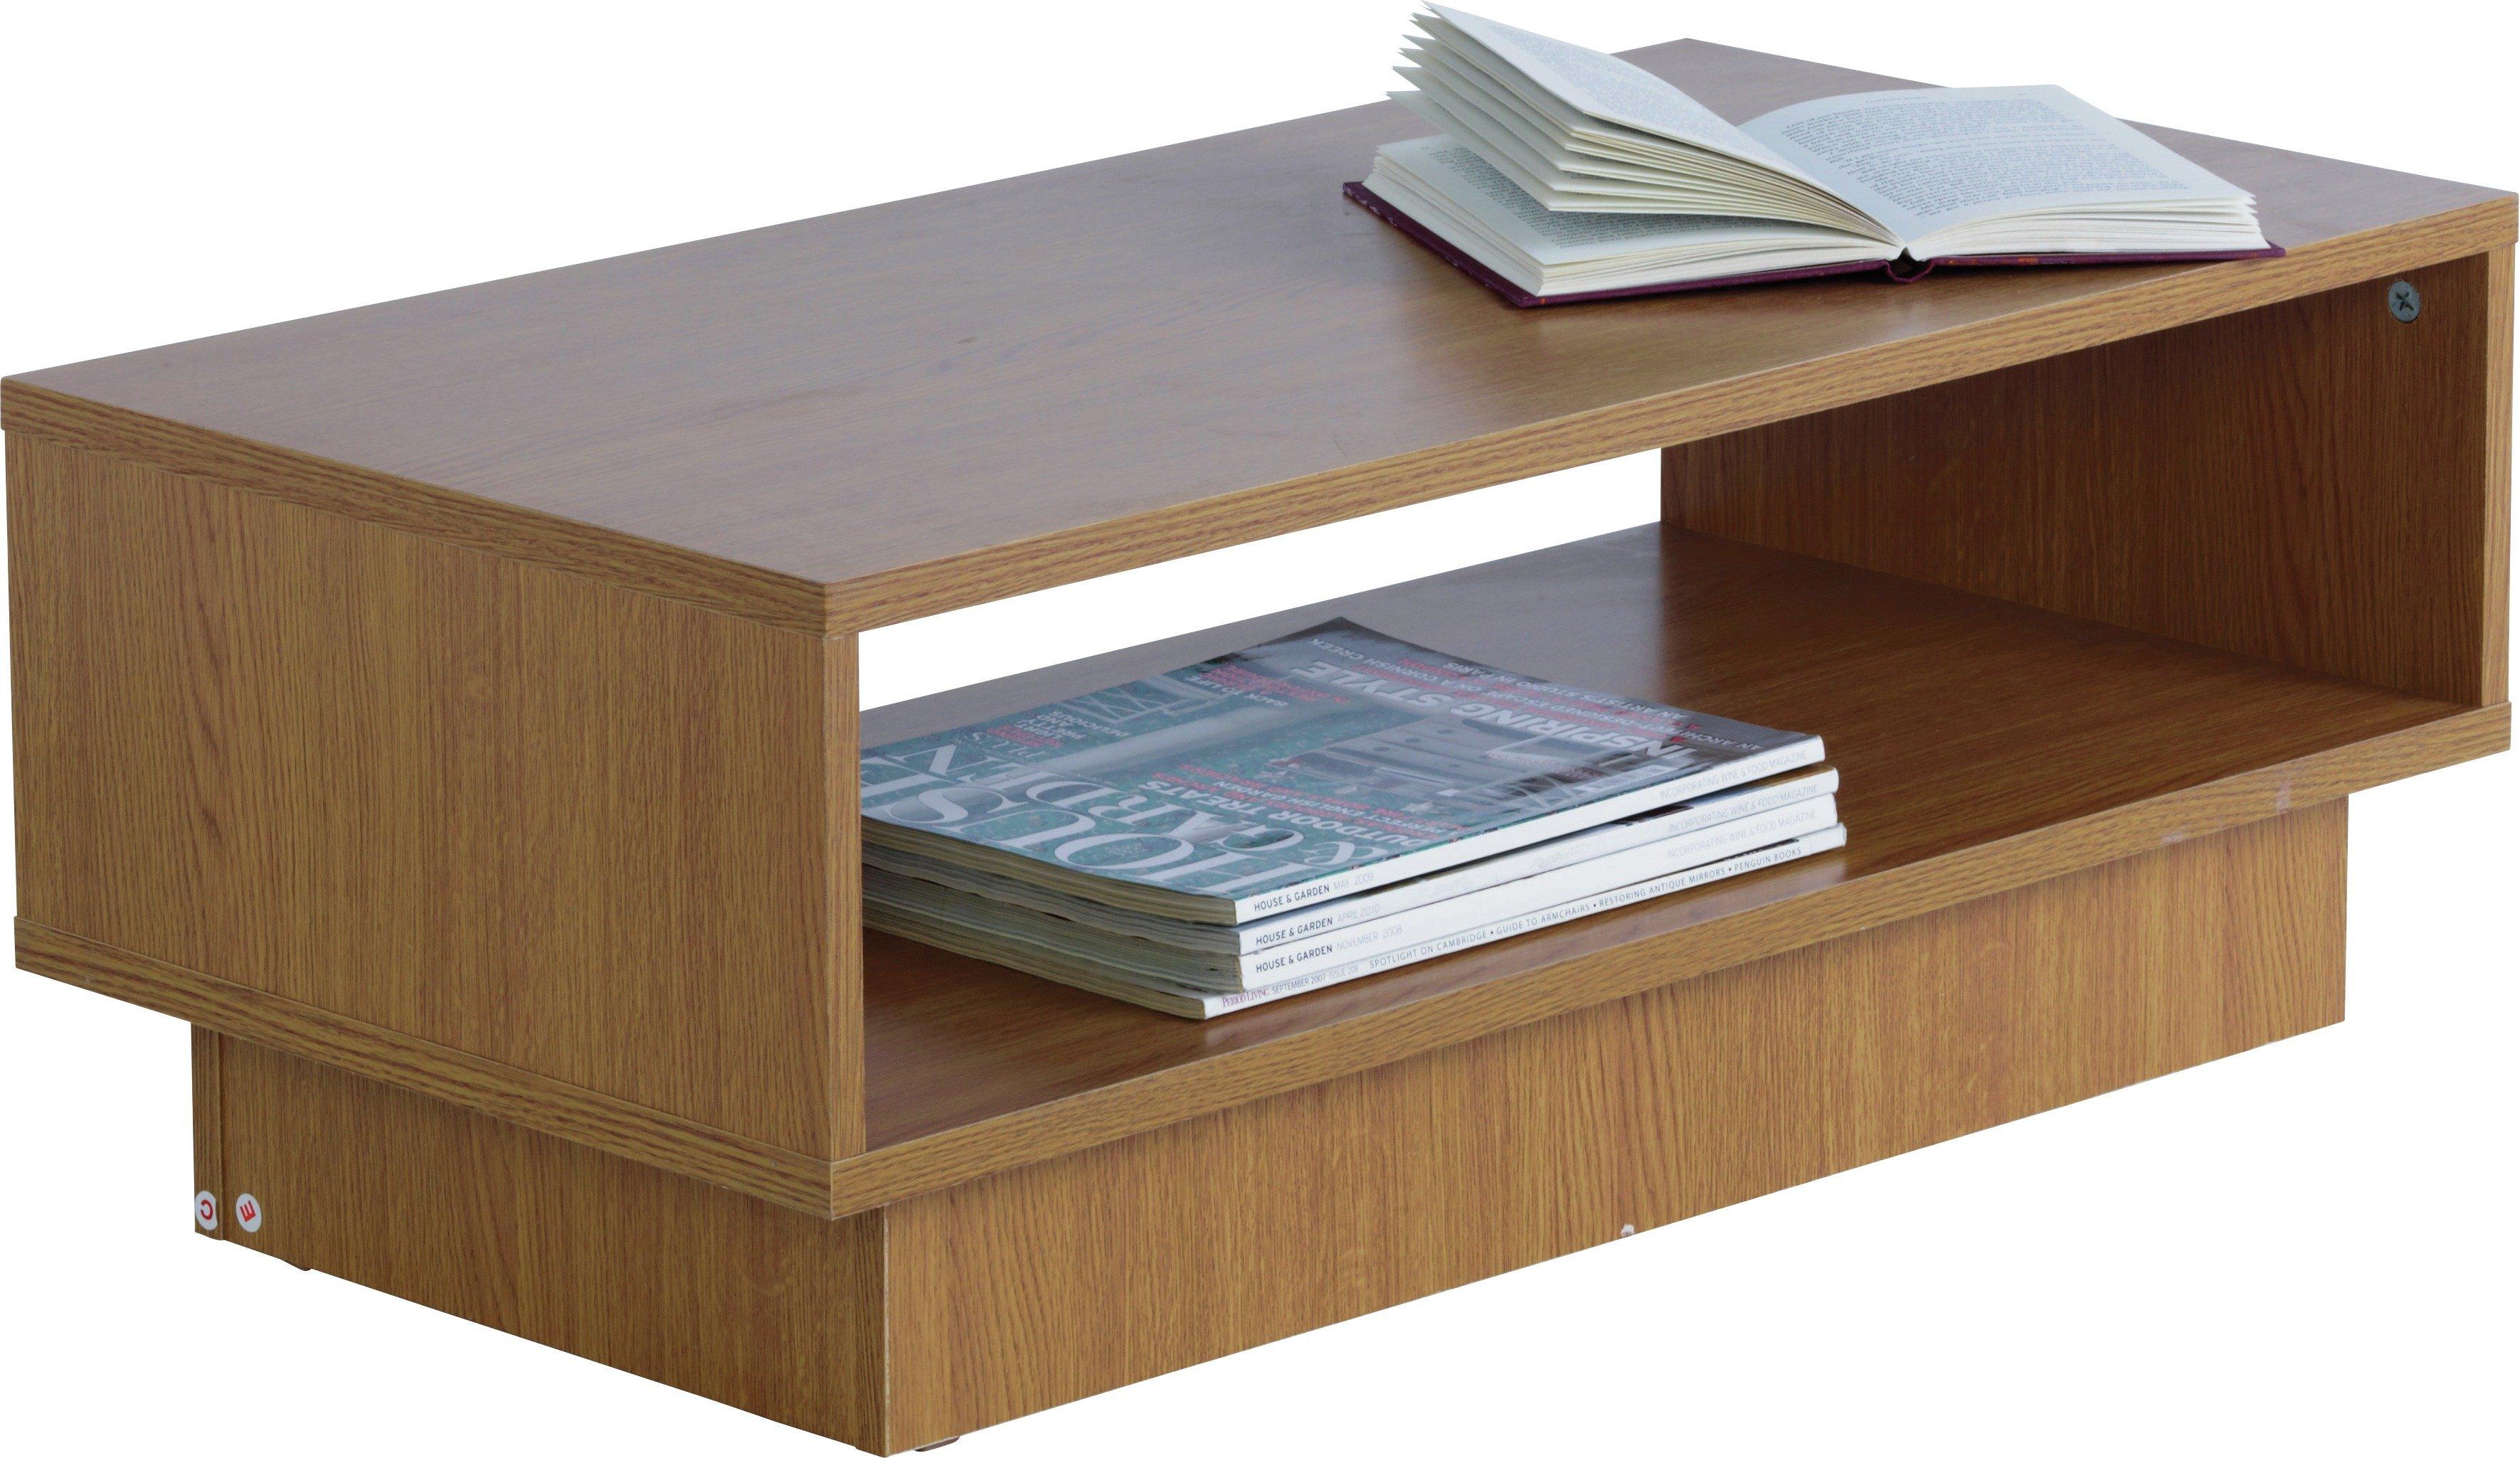 buy home cubes 1 shelf coffee table - oak effect at argos.co.uk